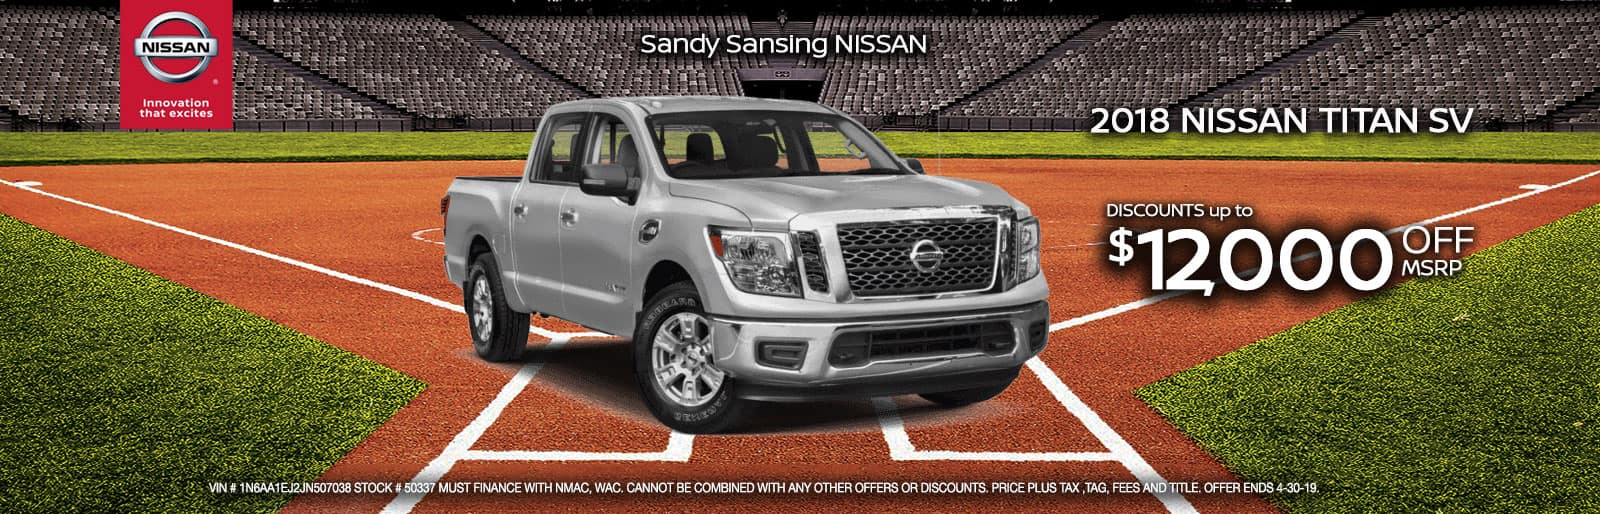 Sandy Sansing Nissan Pensacola FL Titan